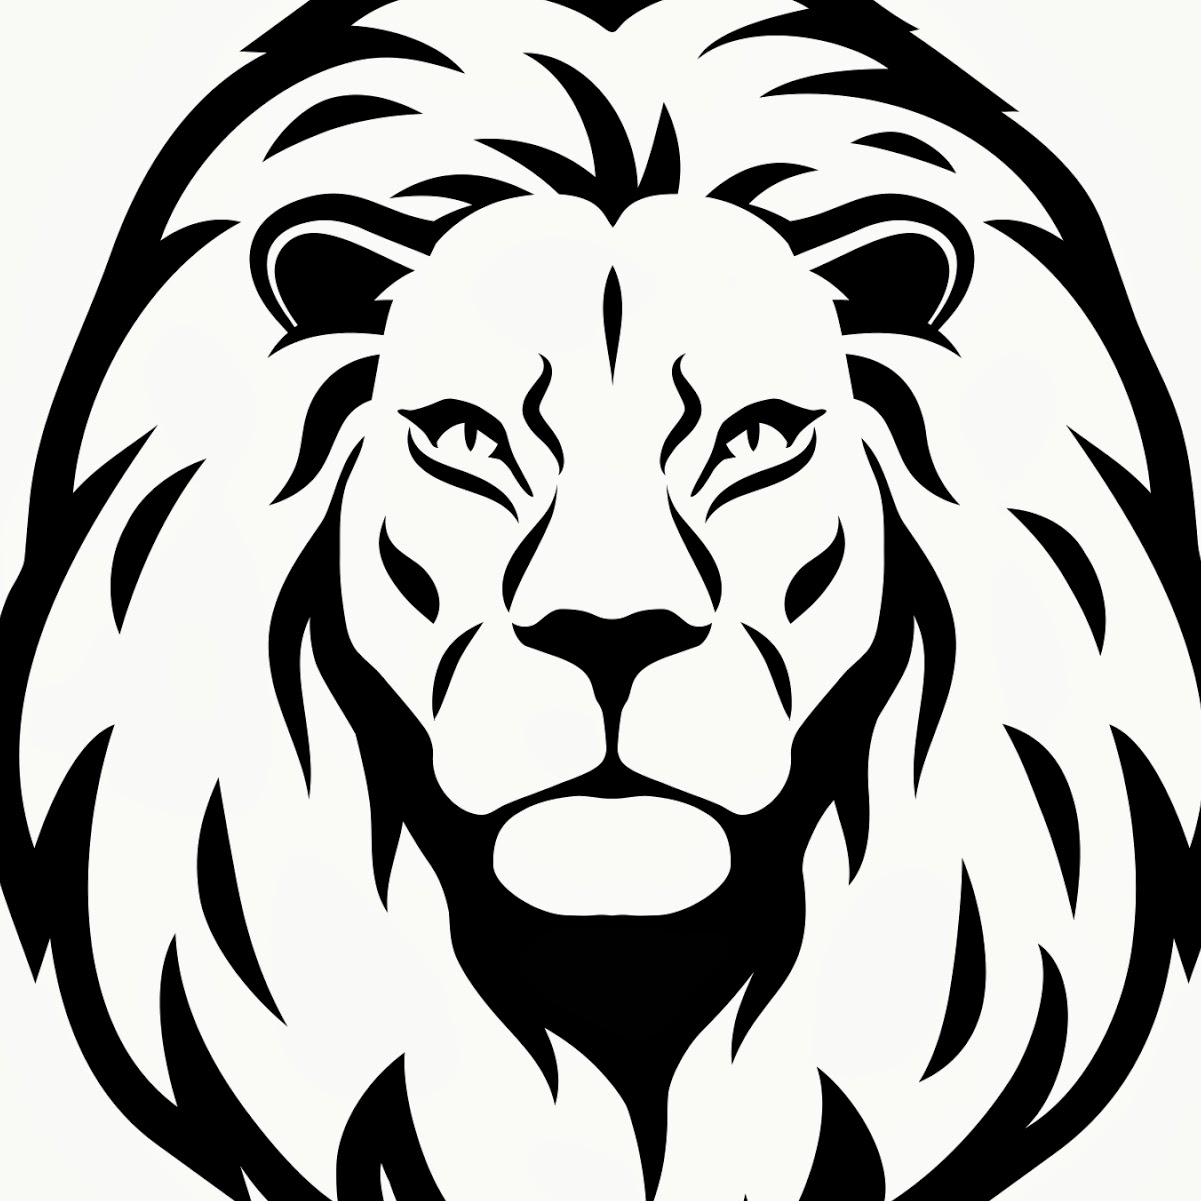 Aslan Drawing at GetDrawings com | Free for personal use Aslan